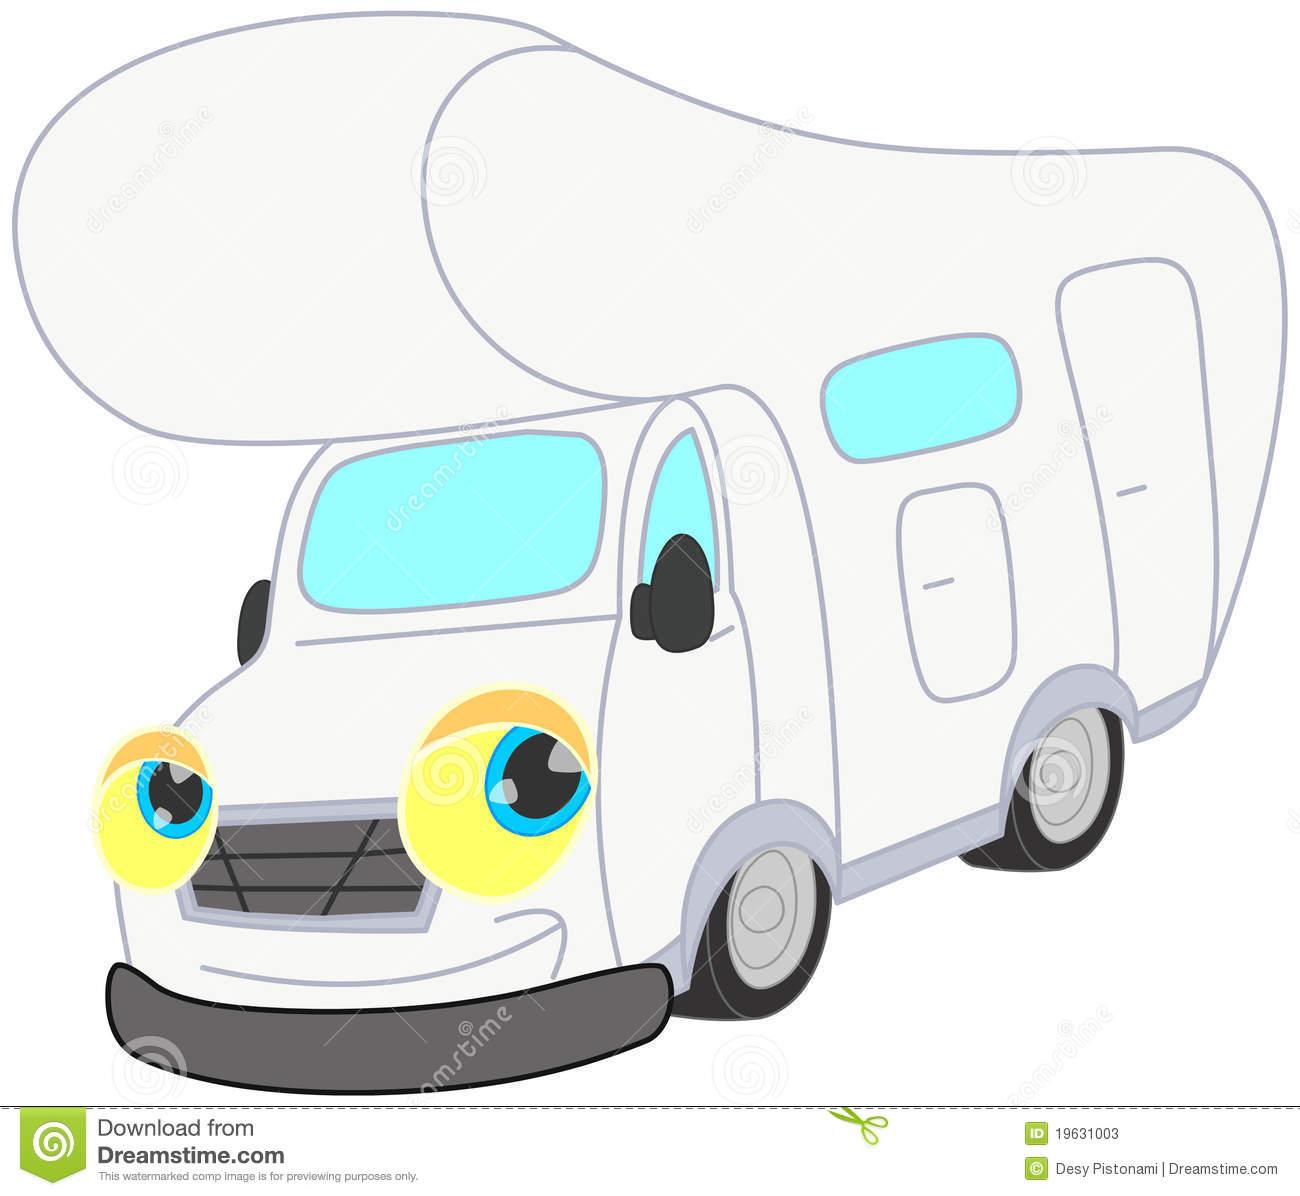 Wohnwagen clipart kostenlos clipart royalty free Wohnwagen clipart kostenlos - ClipartFest clipart royalty free